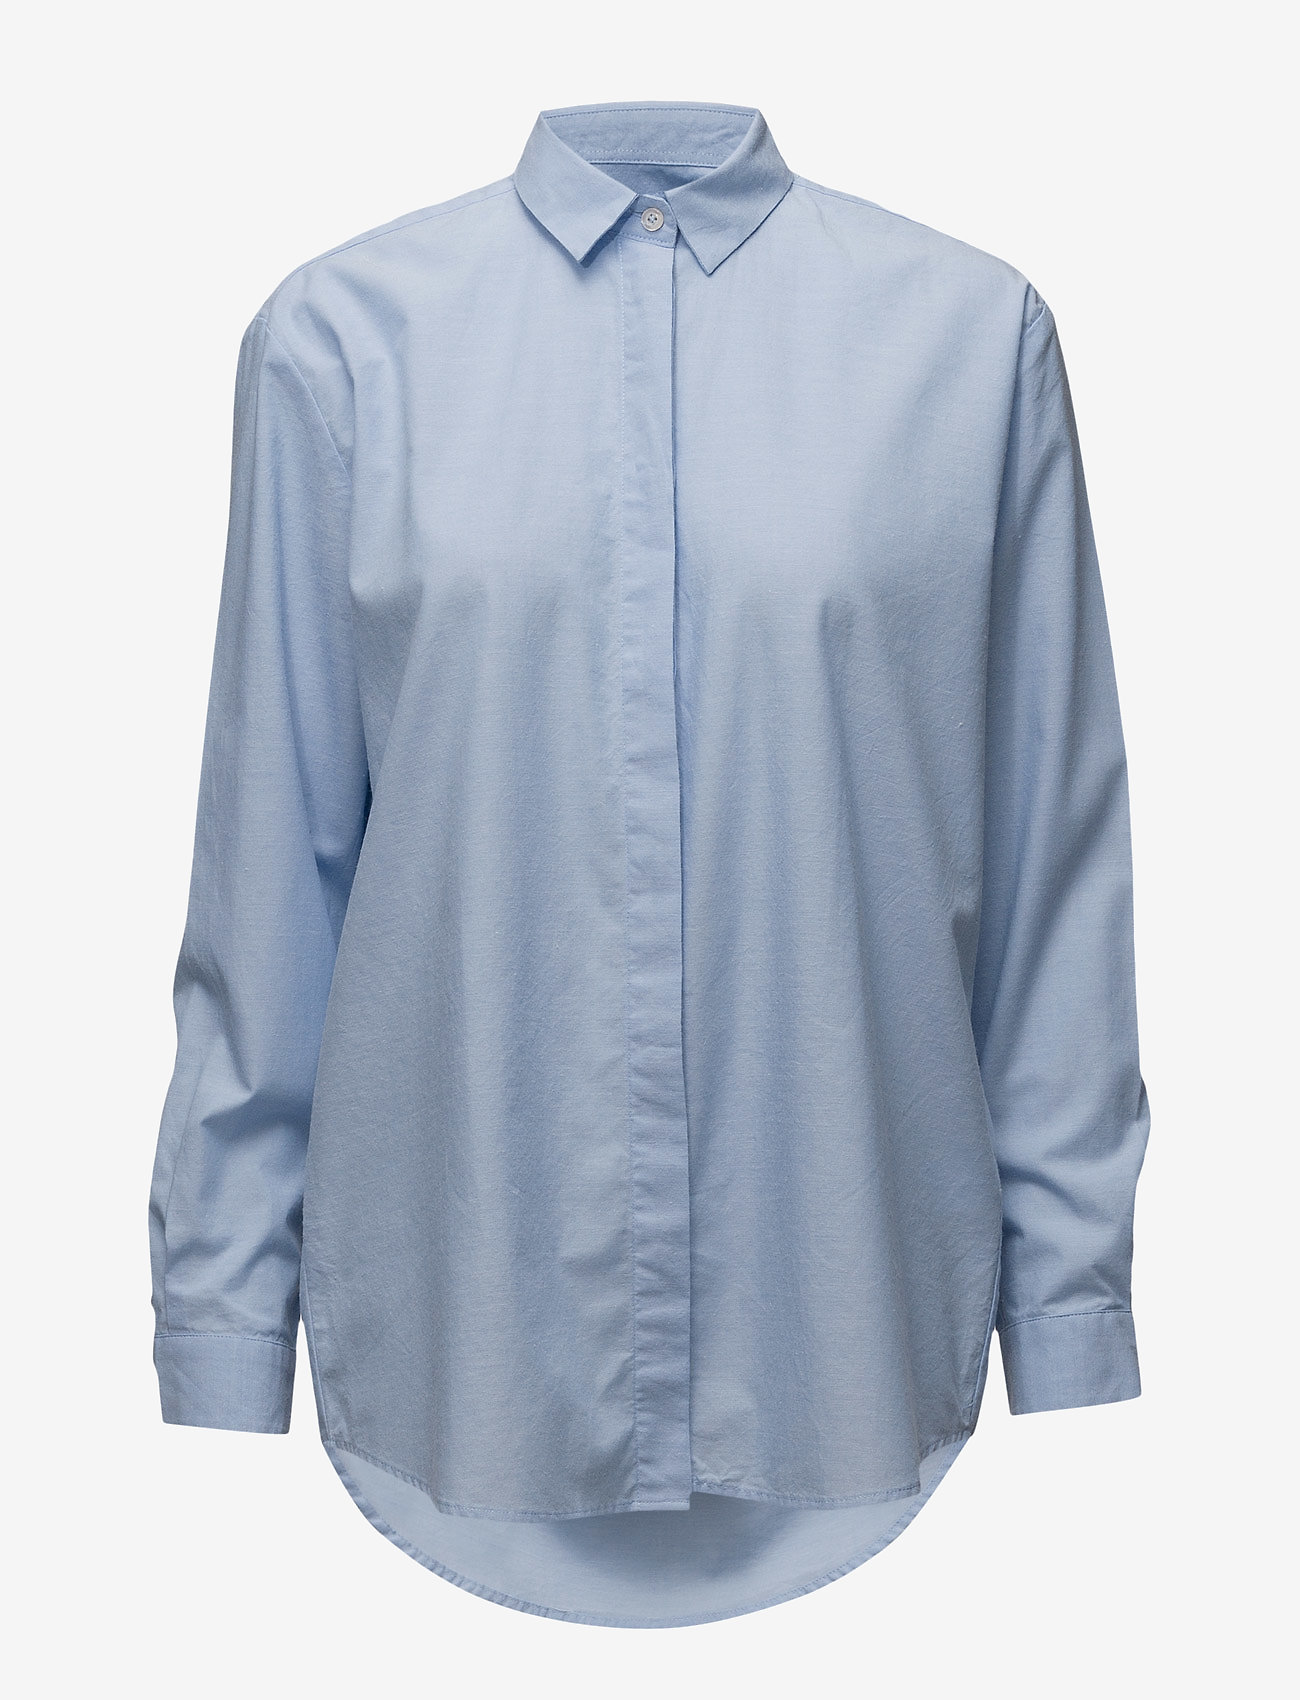 Samsøe Samsøe - Caico shirt 6135 - koszule z długimi rękawami - 6135 oxford blue - 0